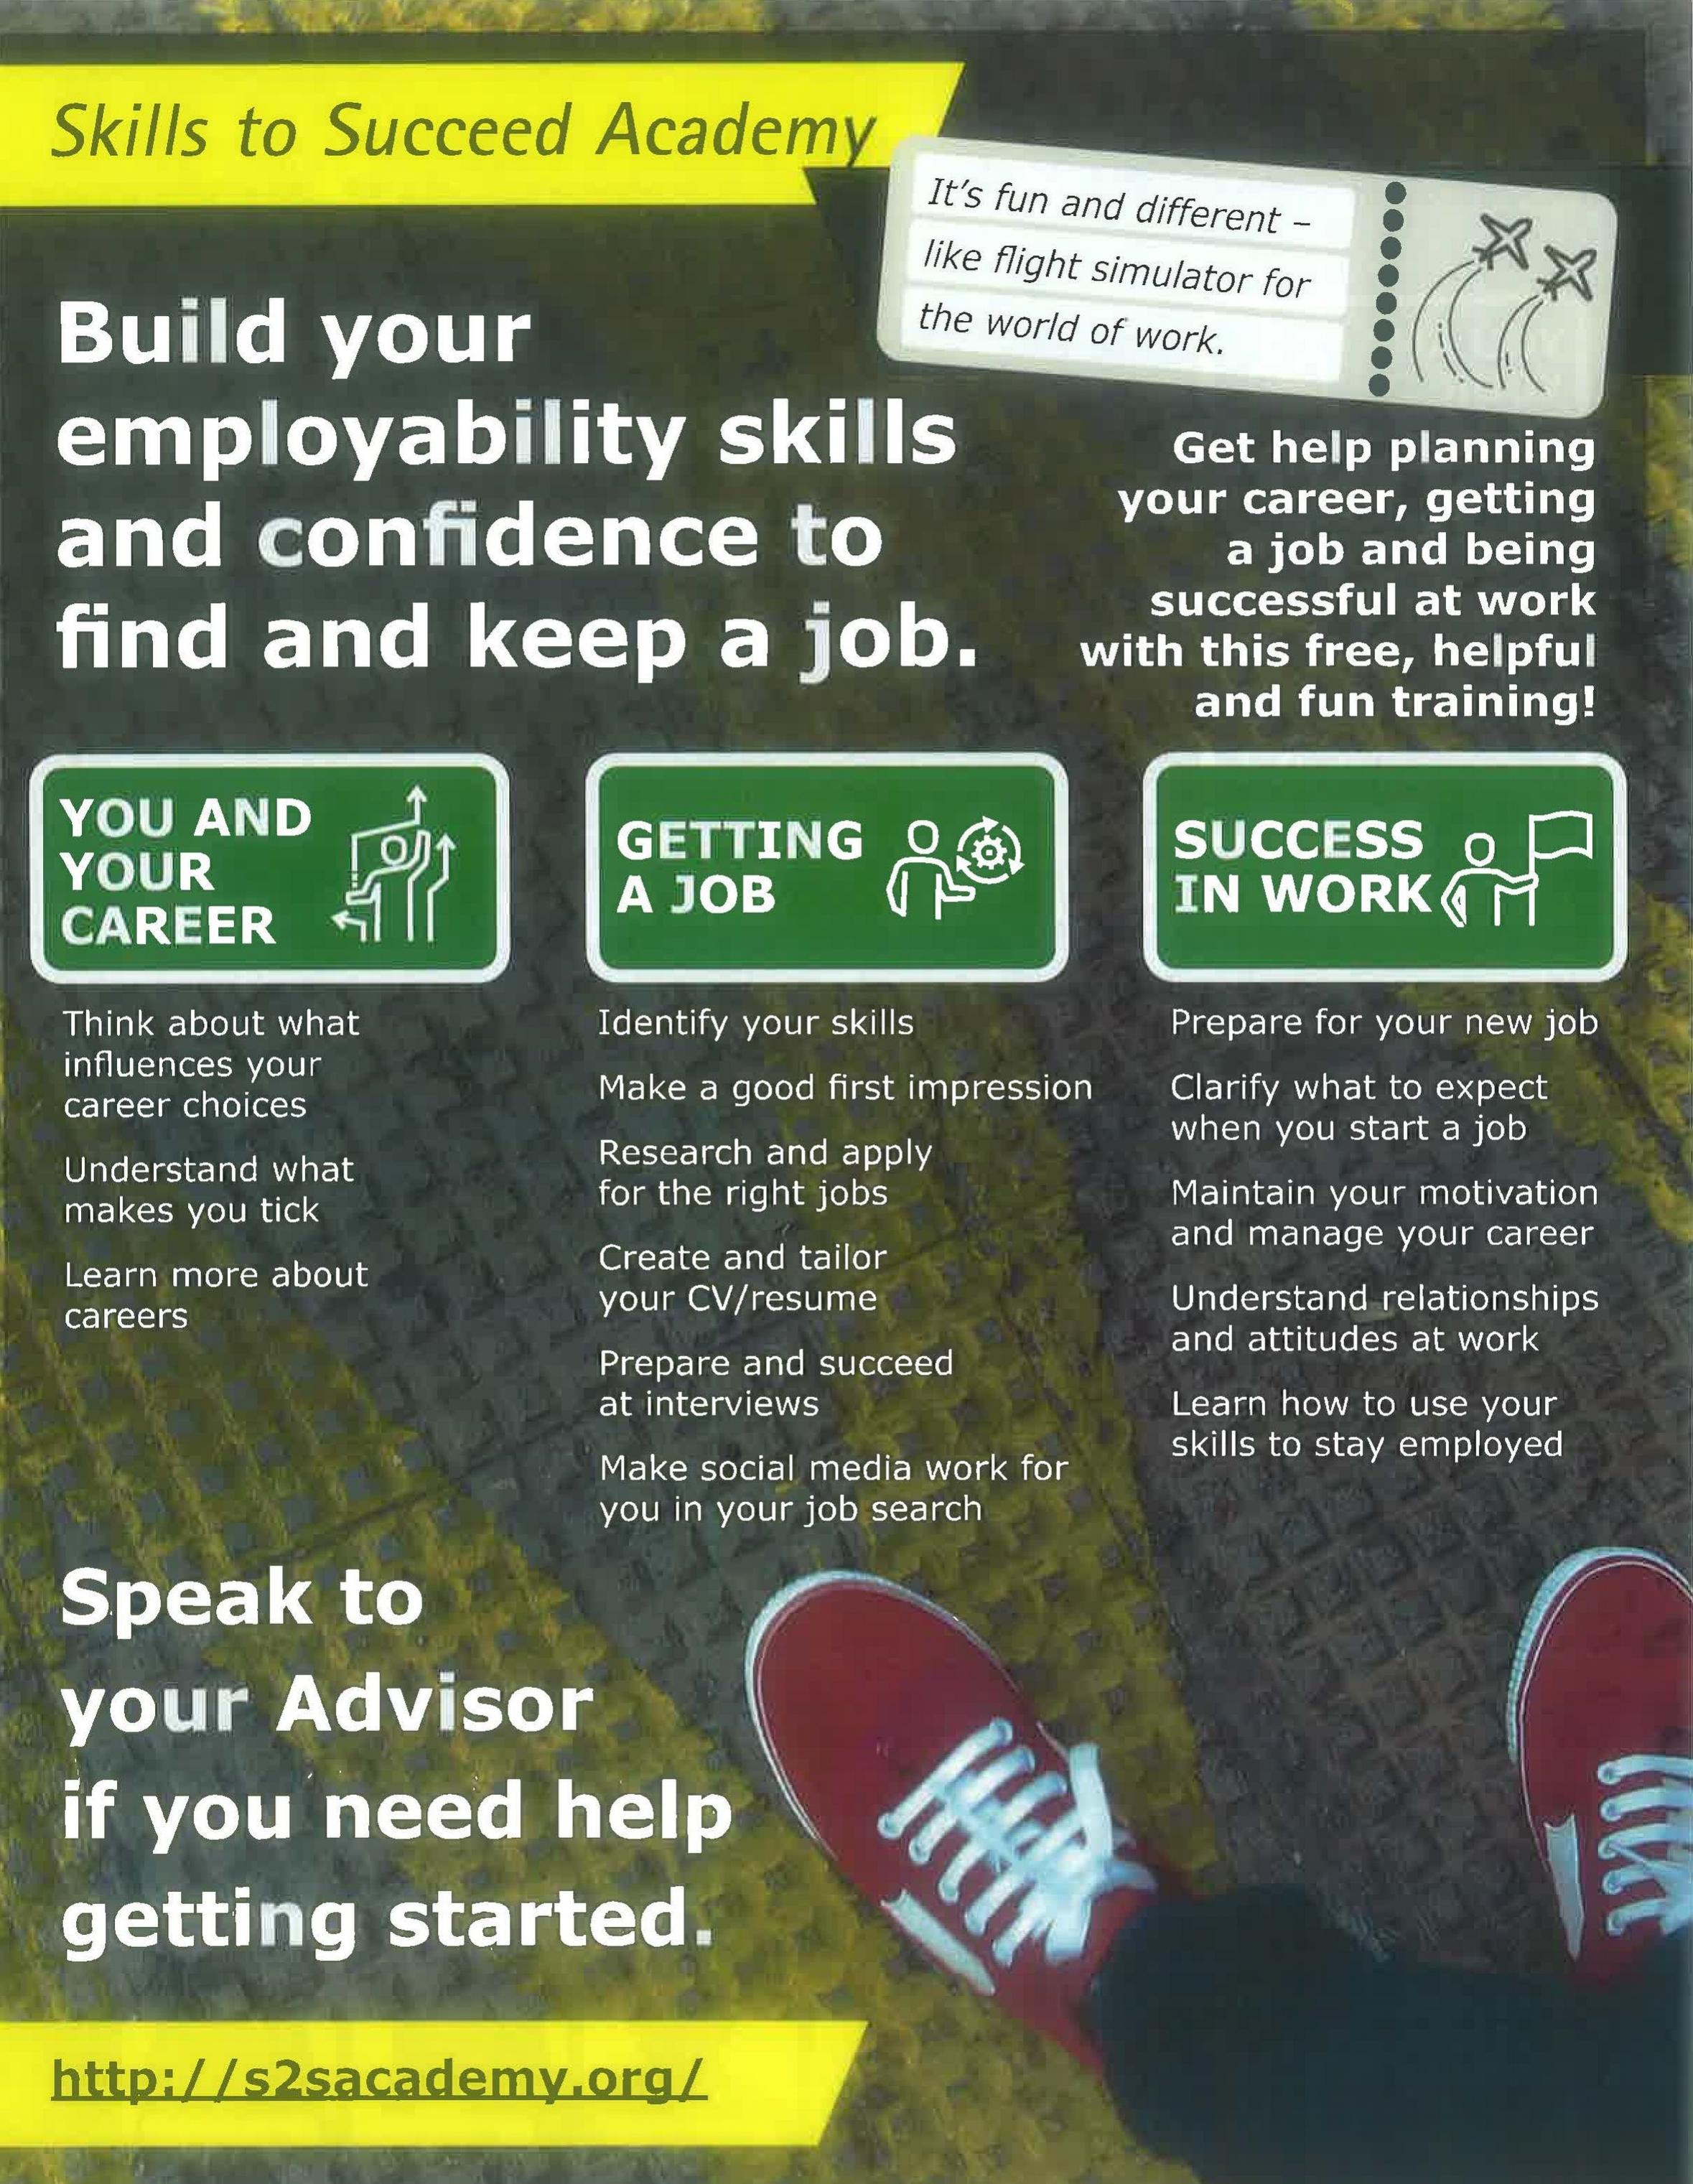 Goodwill Skills2SucceedAcademyflier.jpg